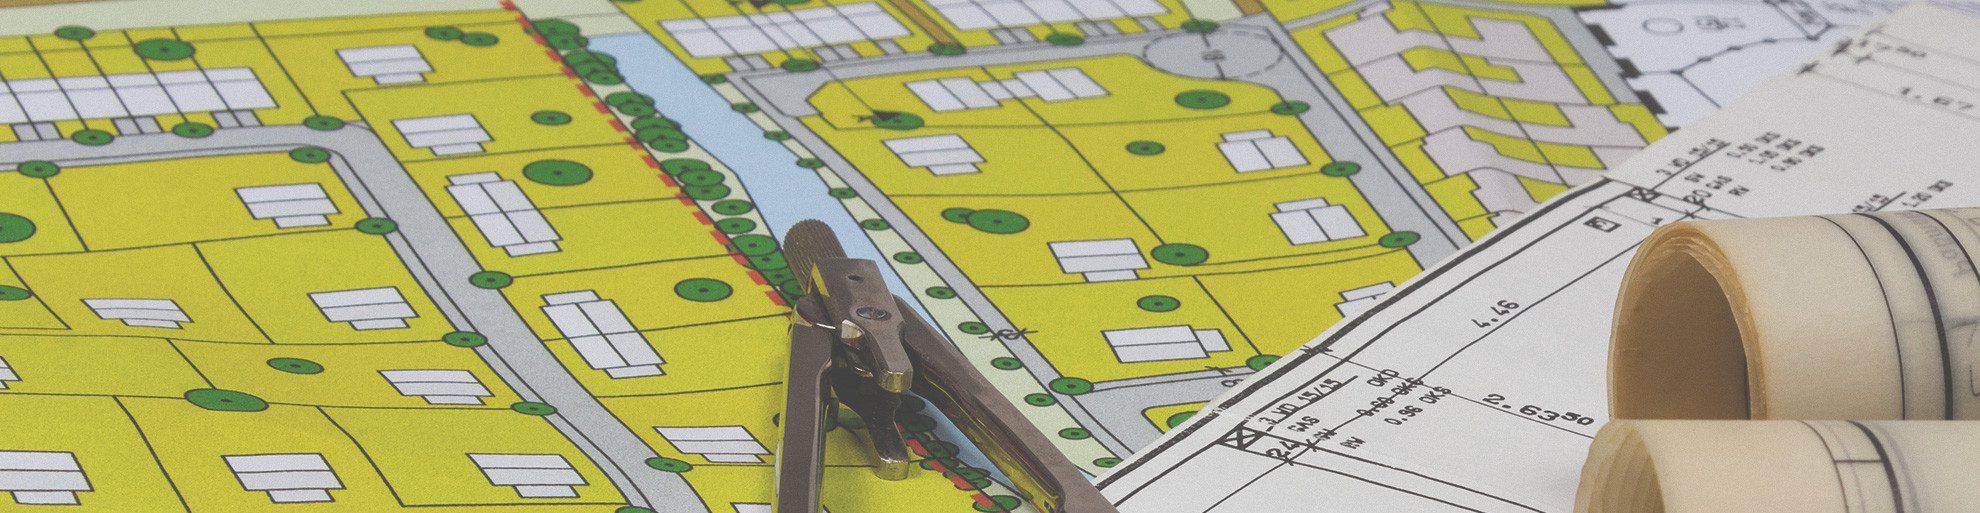 Aménagement et urbanisme